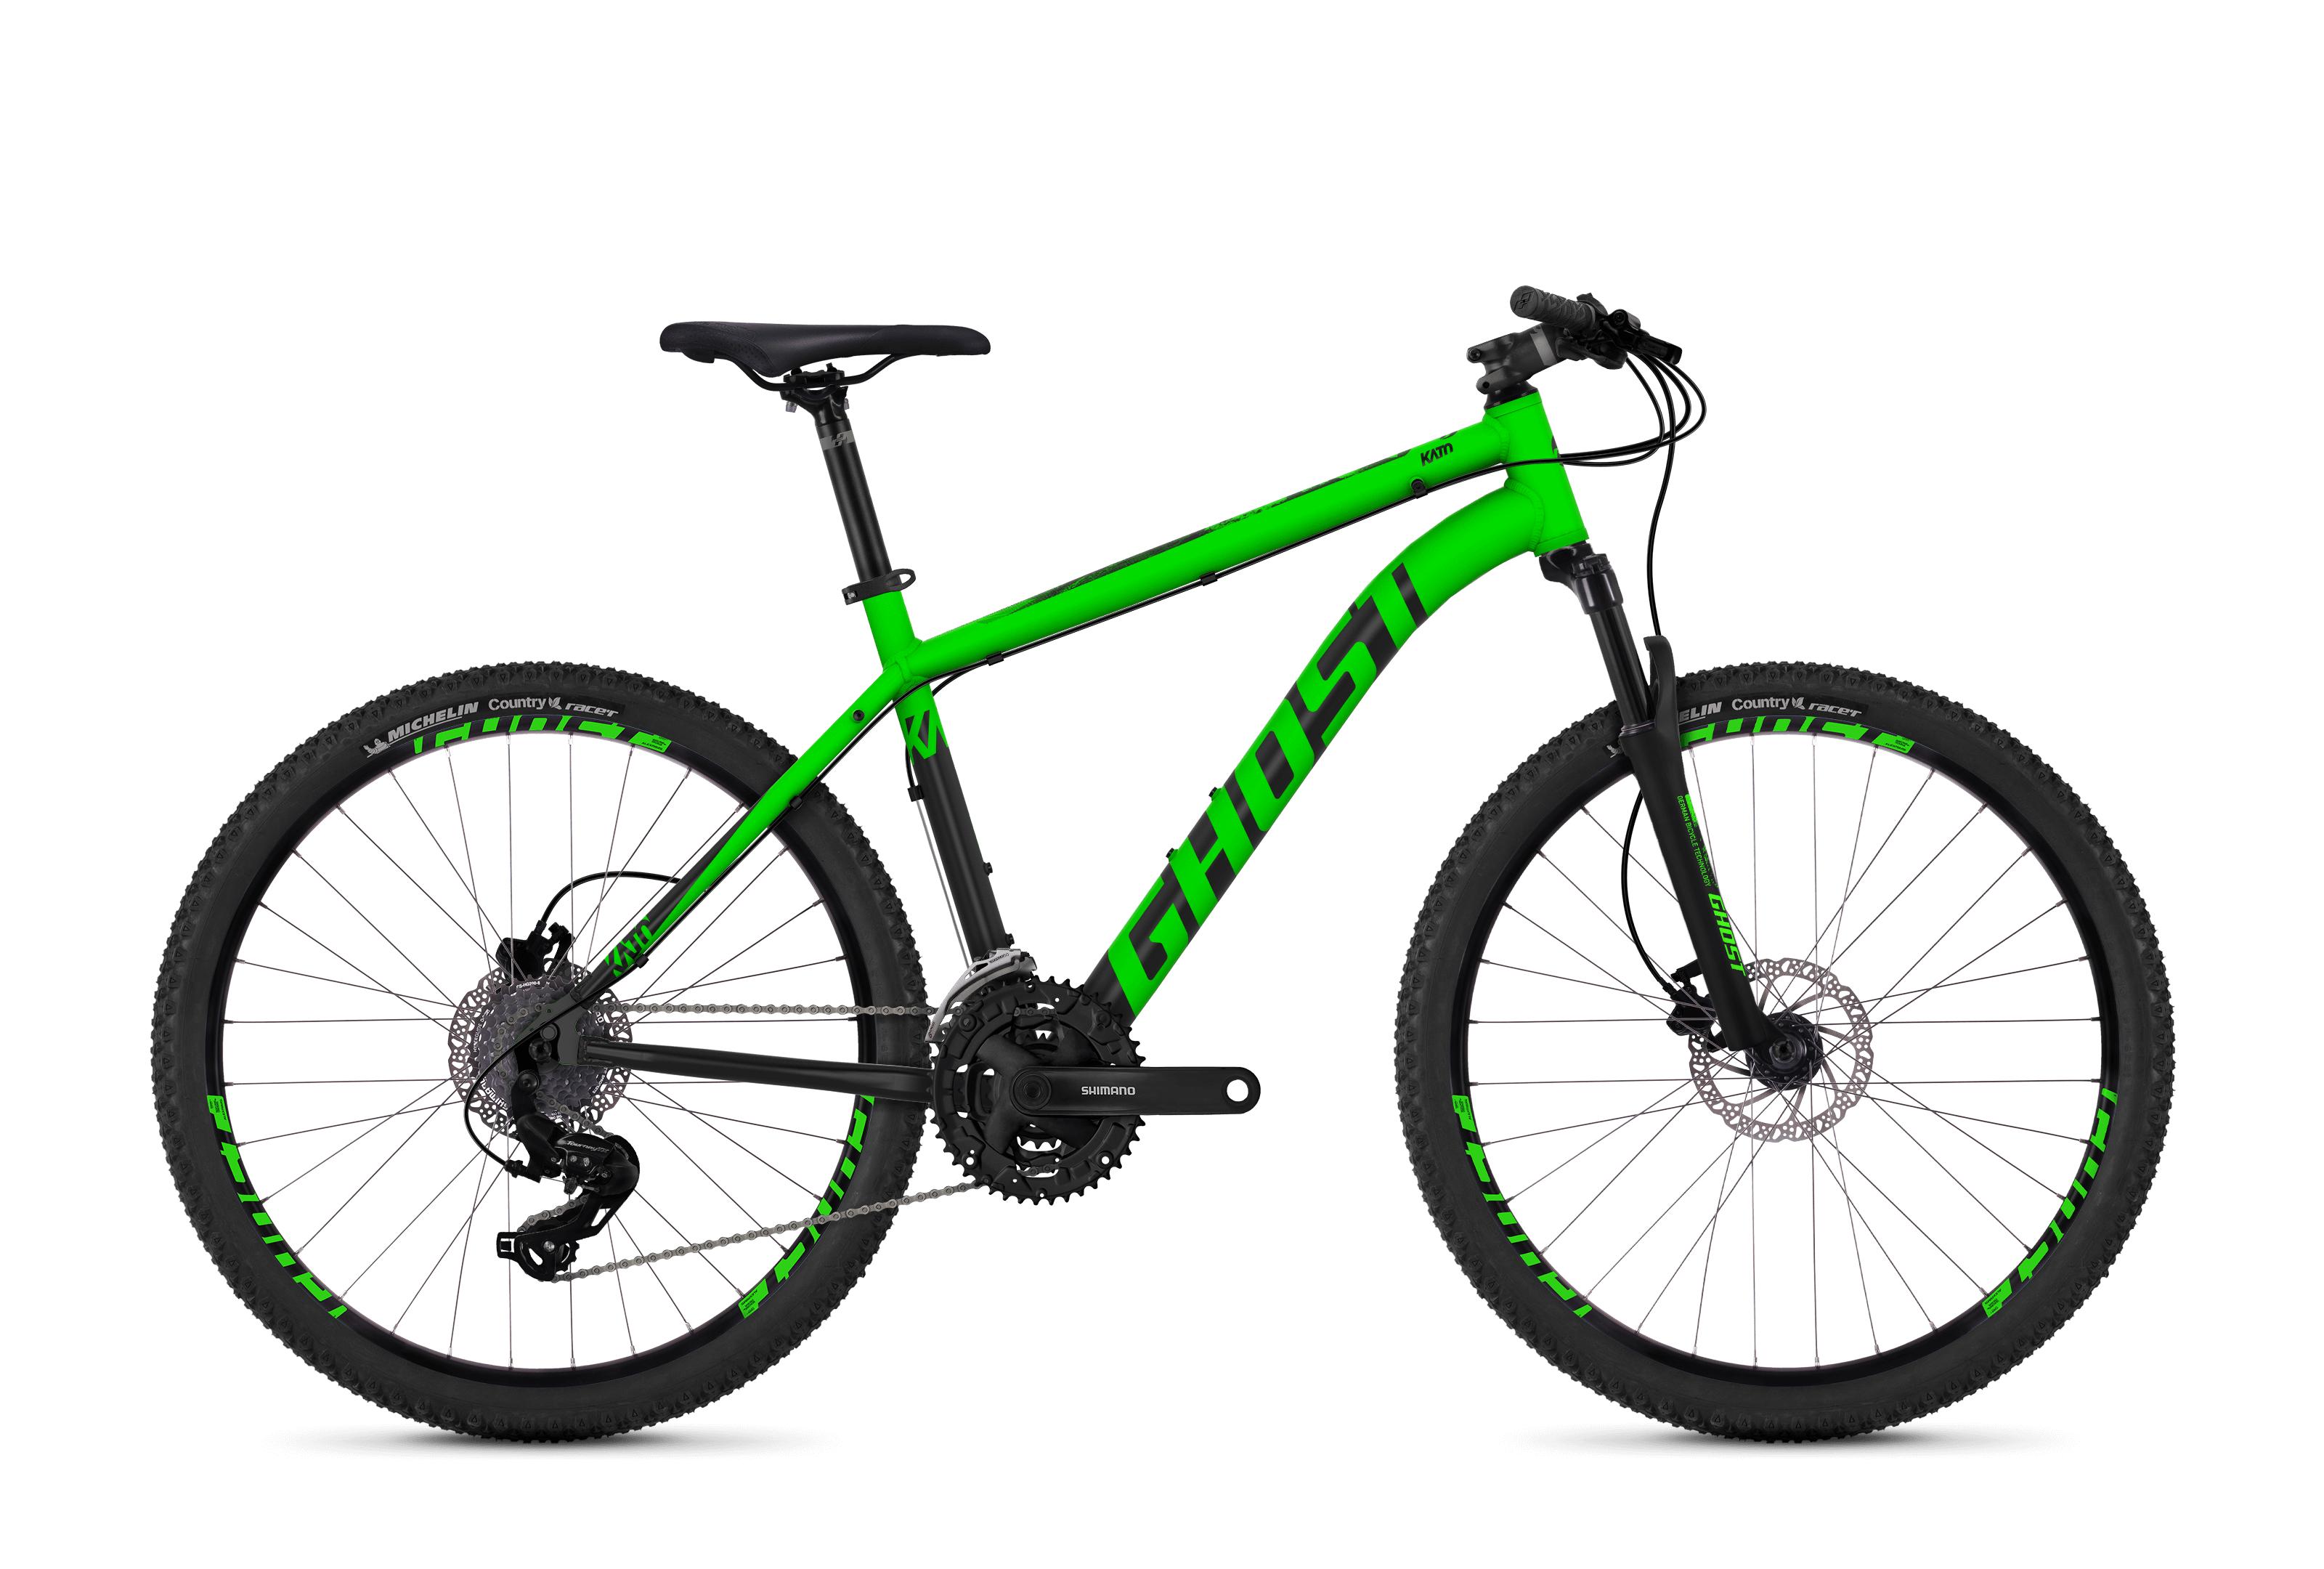 Horské kolo GHOST Kato 1.6 green / black S 2018